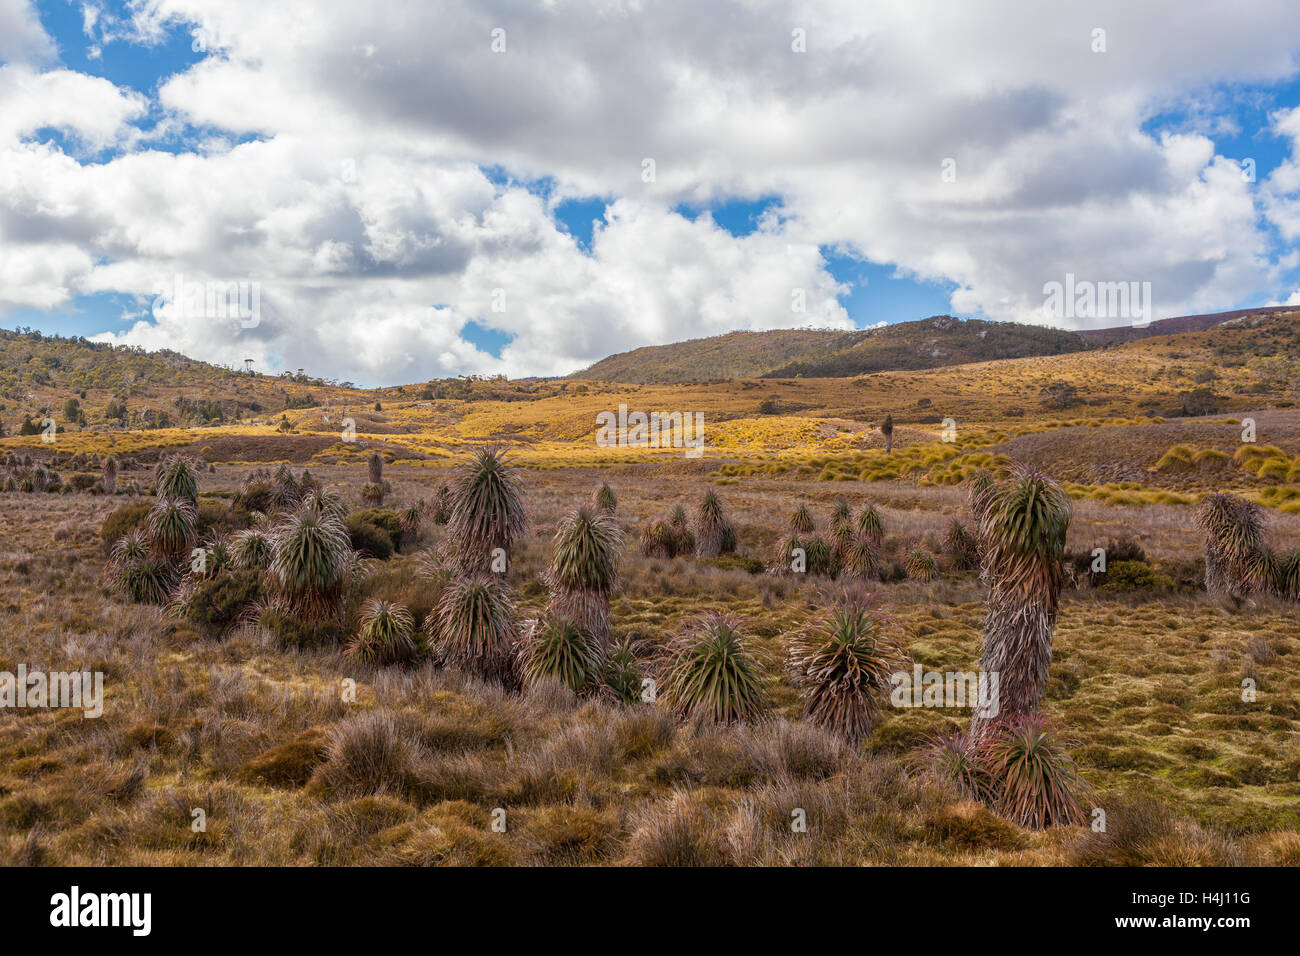 Native vegetation on highland plains at Cradle Mountain National Park on bright sunny day. Tasmania, Australia - Stock Image